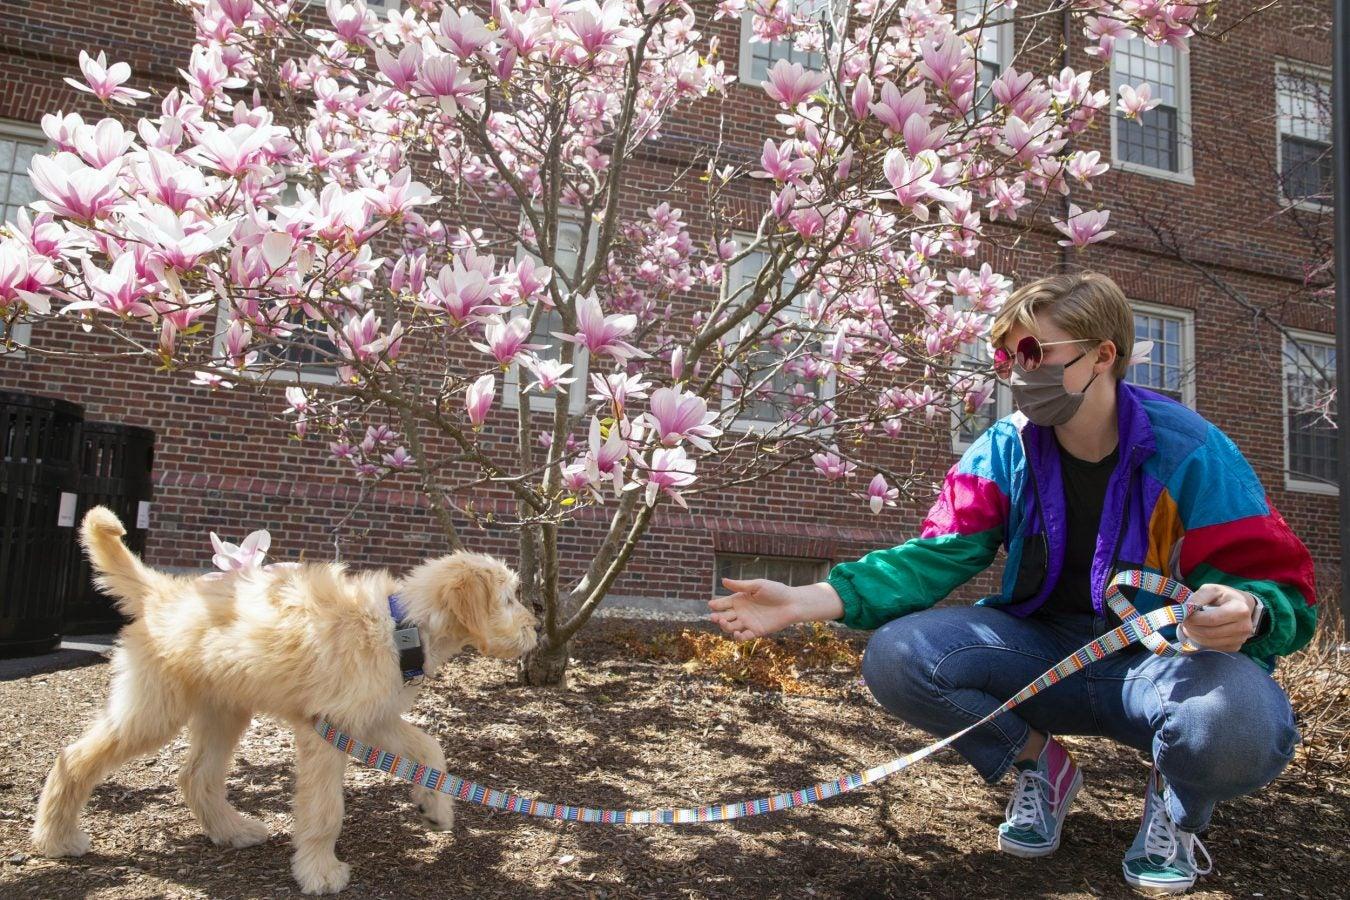 Cassidy Tanner, HBS '21 trains her dog Ellie.